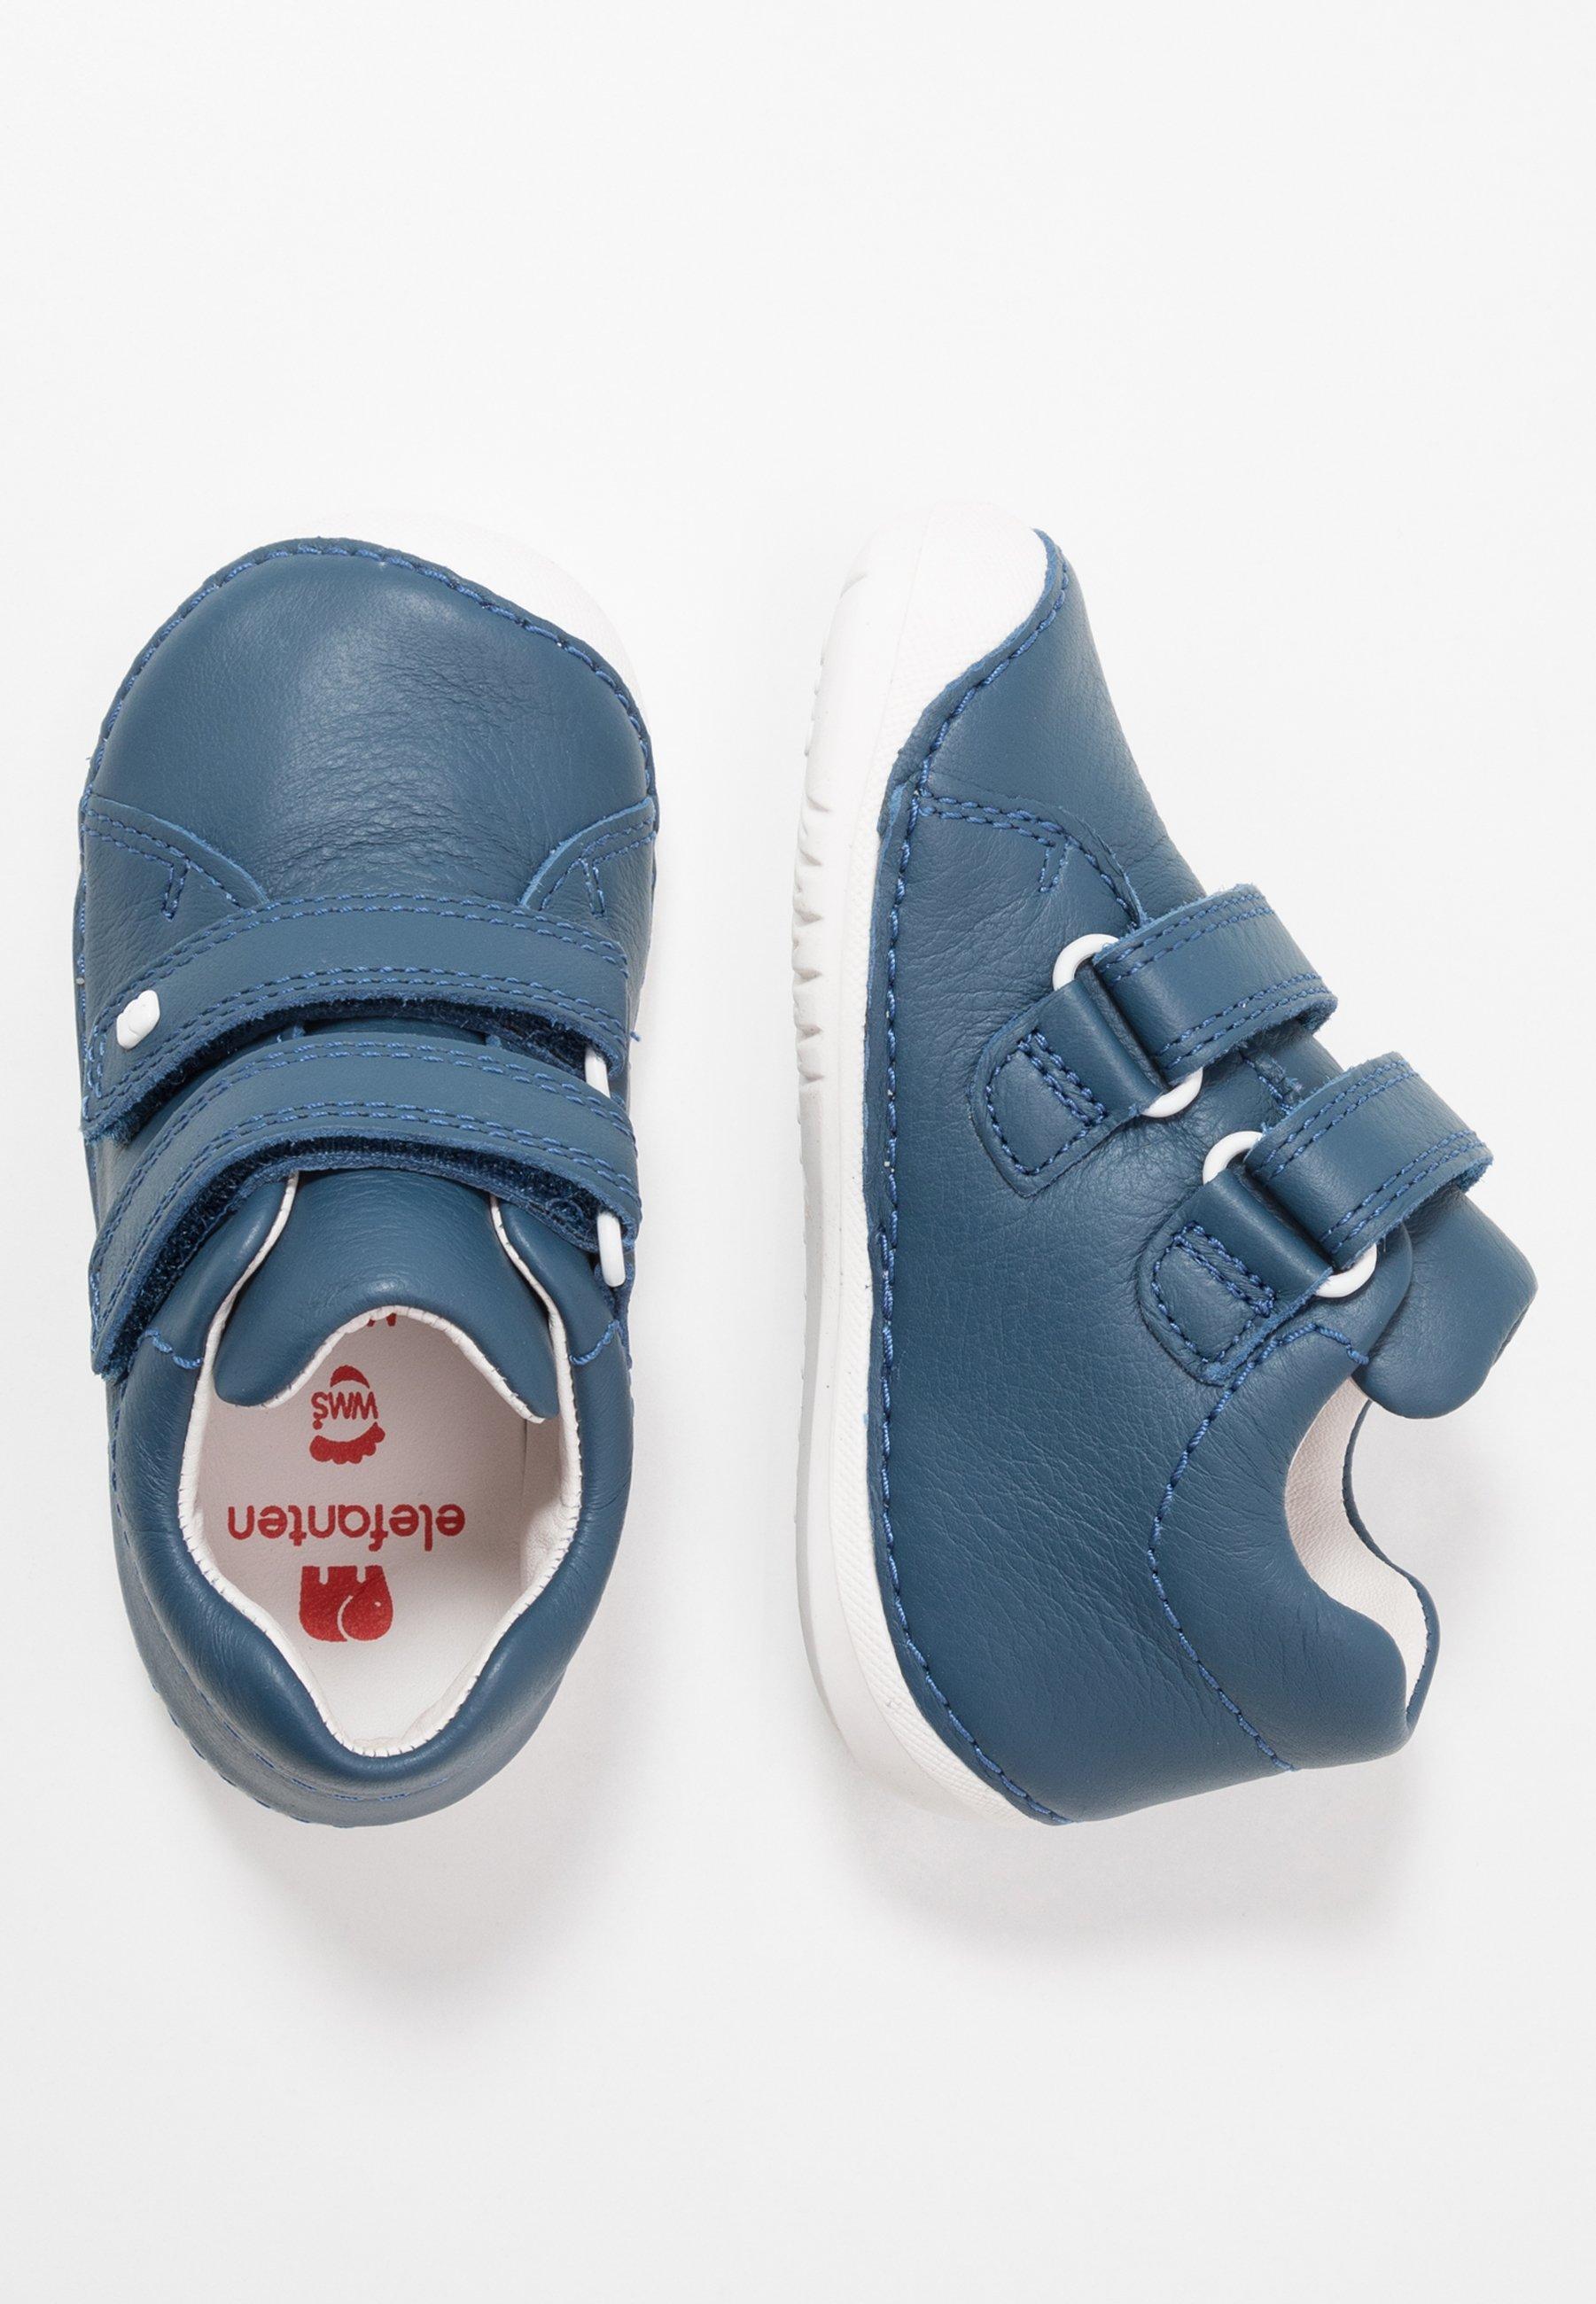 Elefanten Loop Baby Shoes Blue Dark Blue Zalando Co Uk